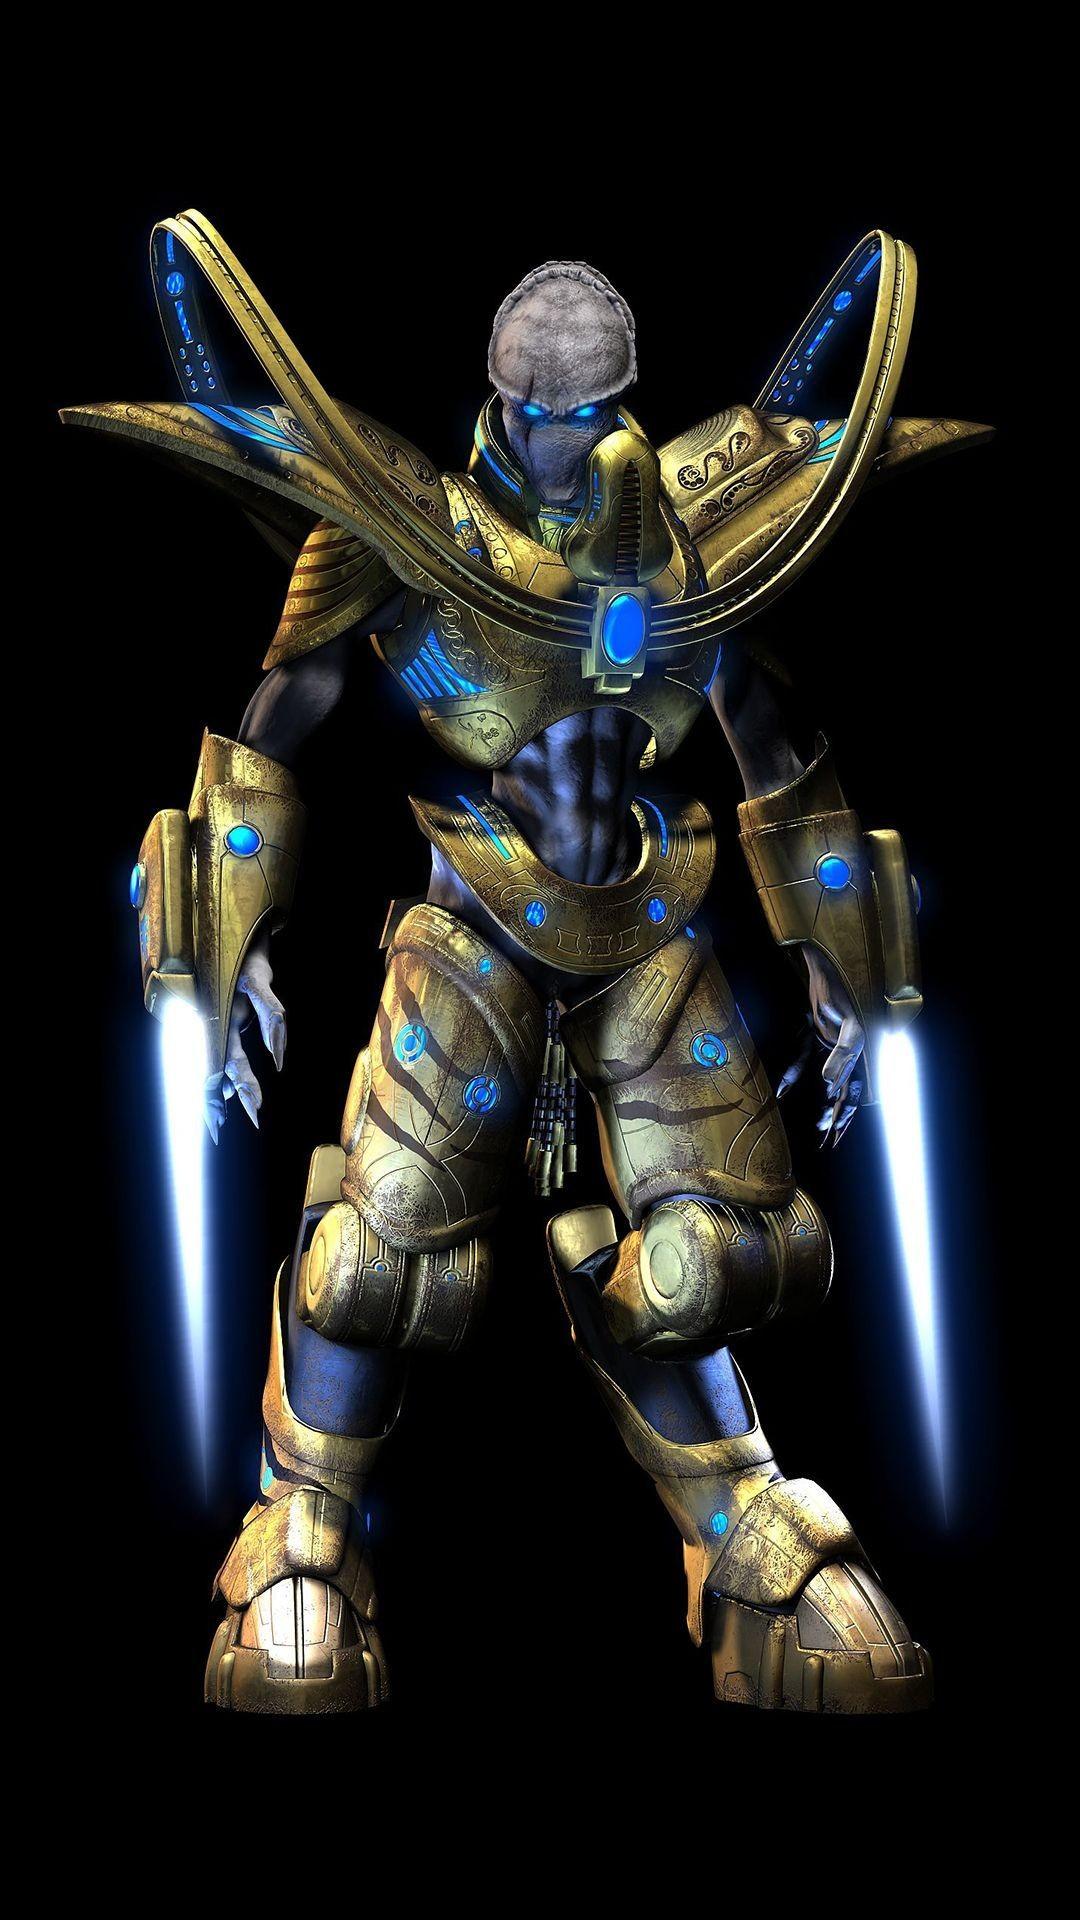 … Protoss – StarCraft Game mobile wallpaper